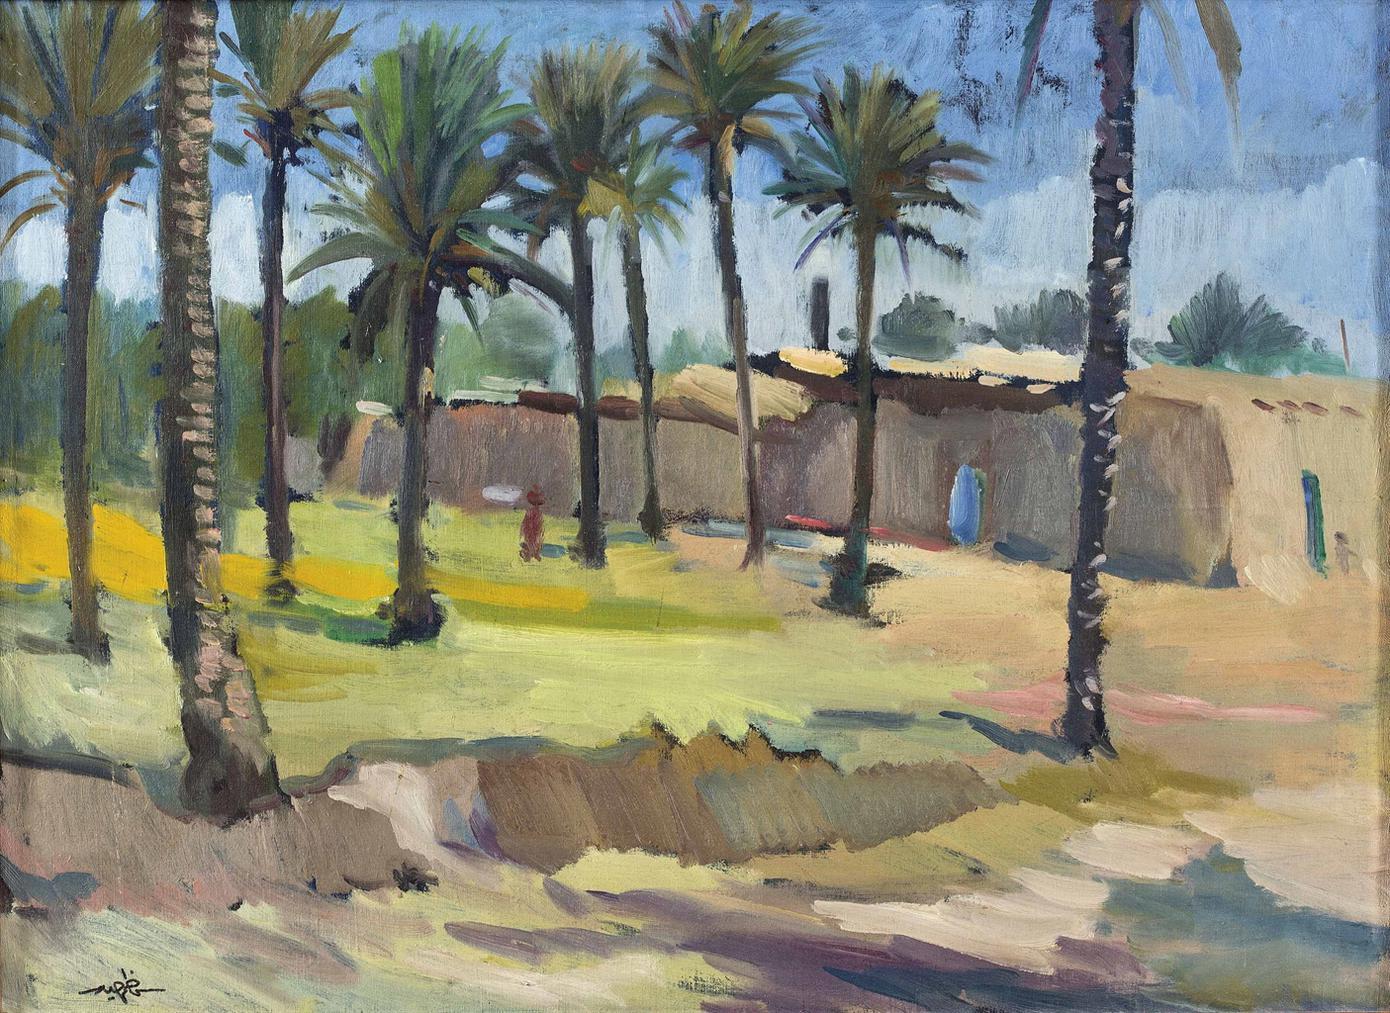 Kadhim Haider - A View Of Palm Trees In Taarimiyah Baghdad-